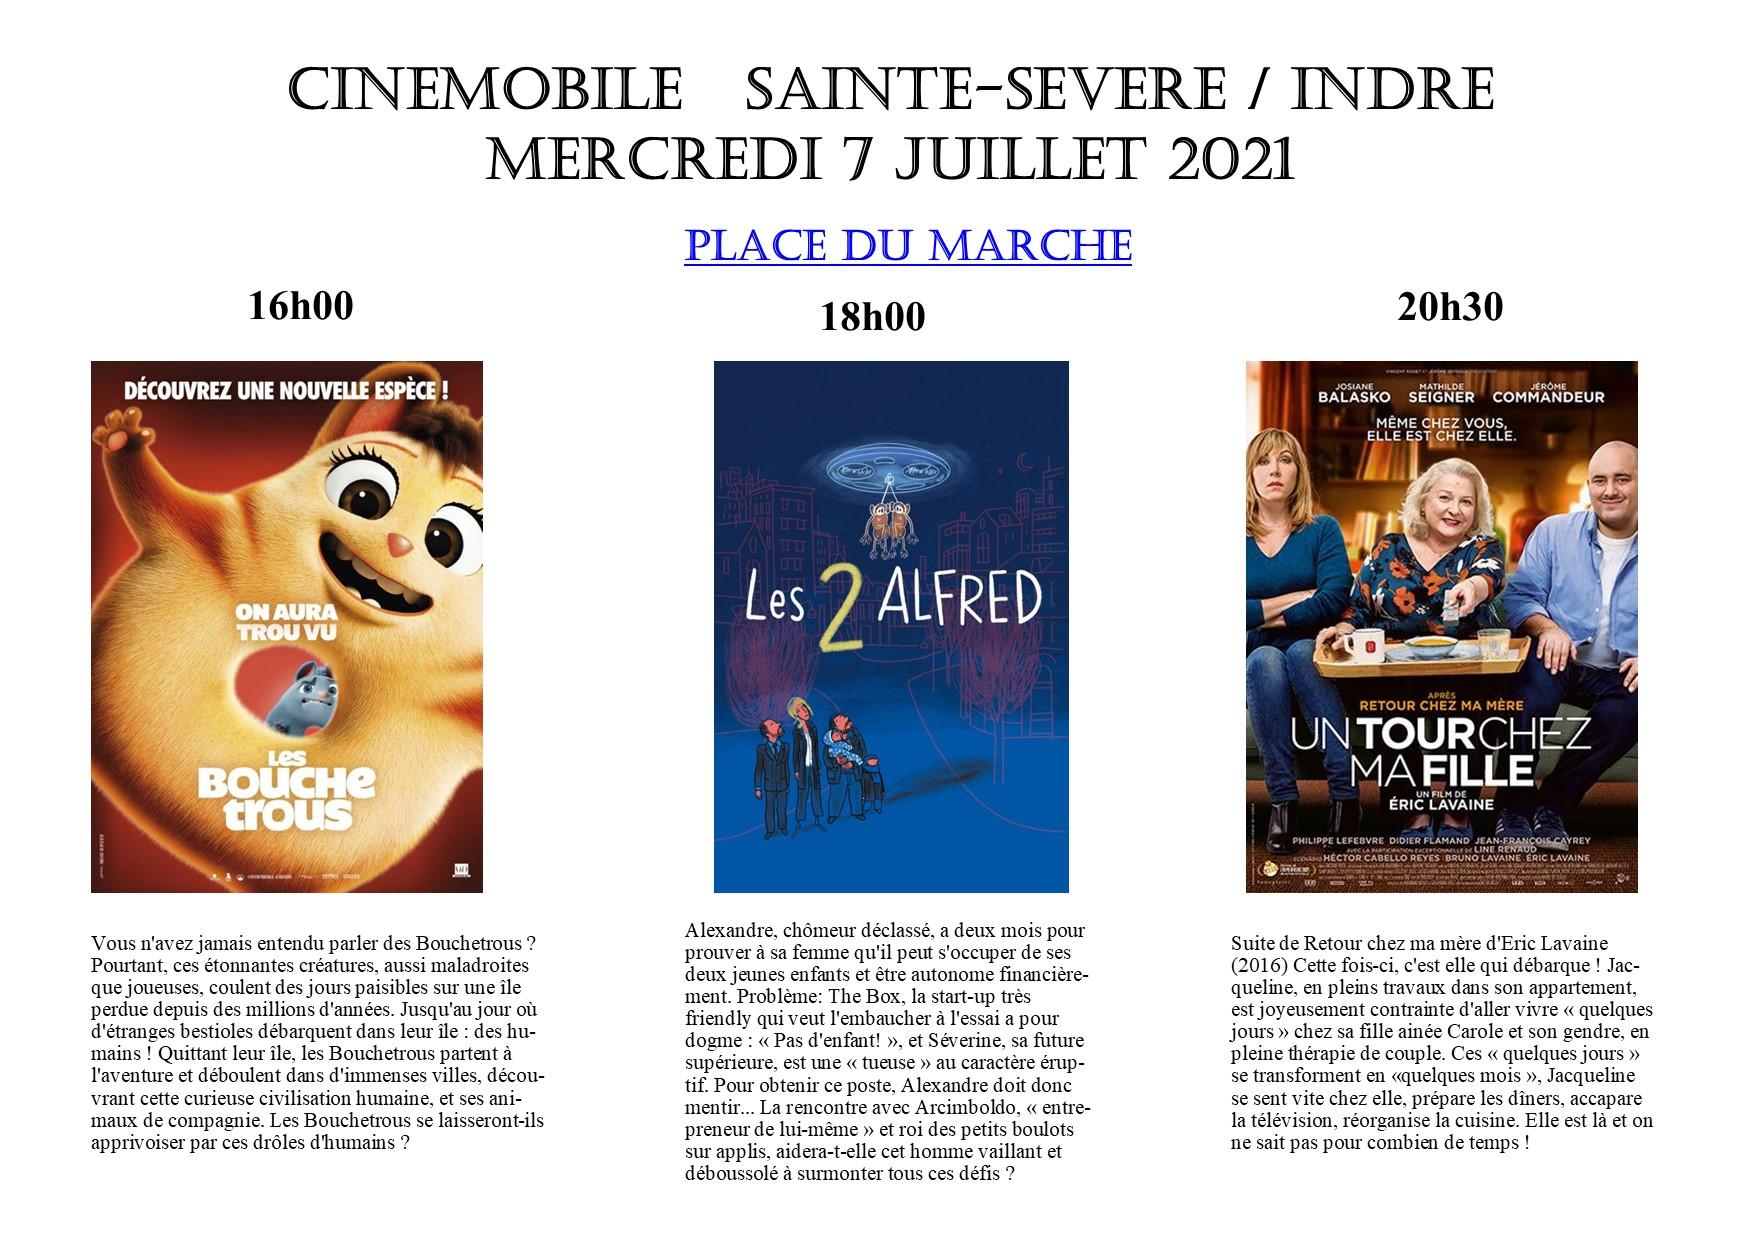 Mercredi 7 juillet – Cinémobile